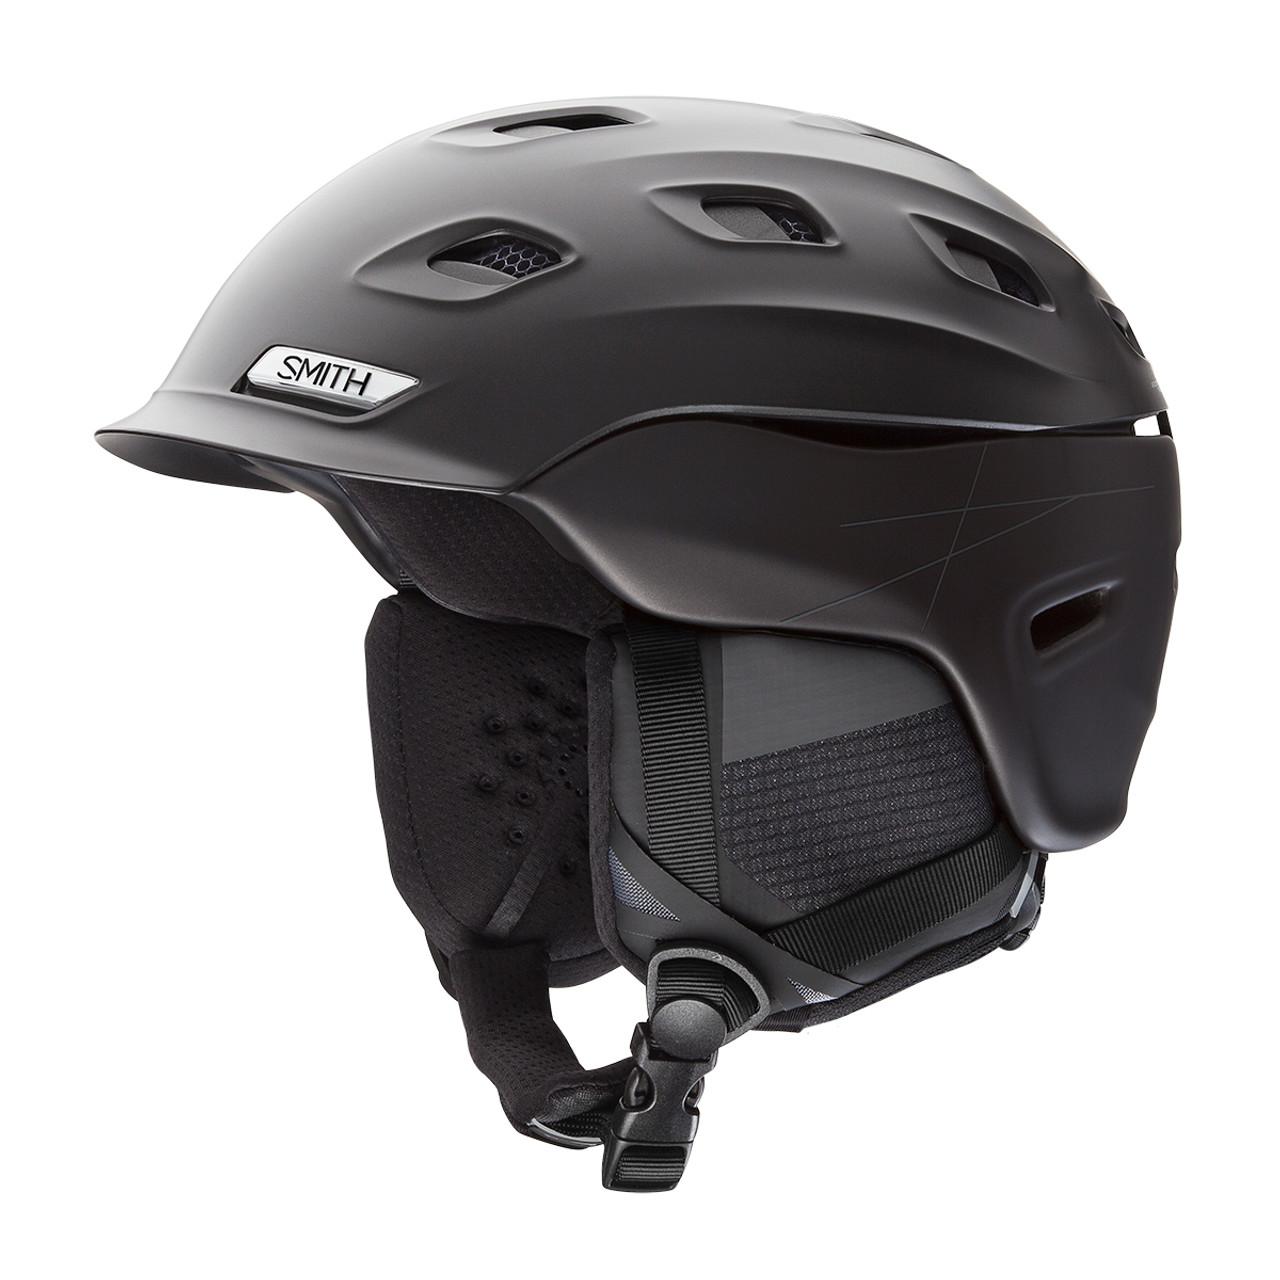 Smith Helmets | Men's Vantage | H18VA18 | Color: Matte Gunmetal